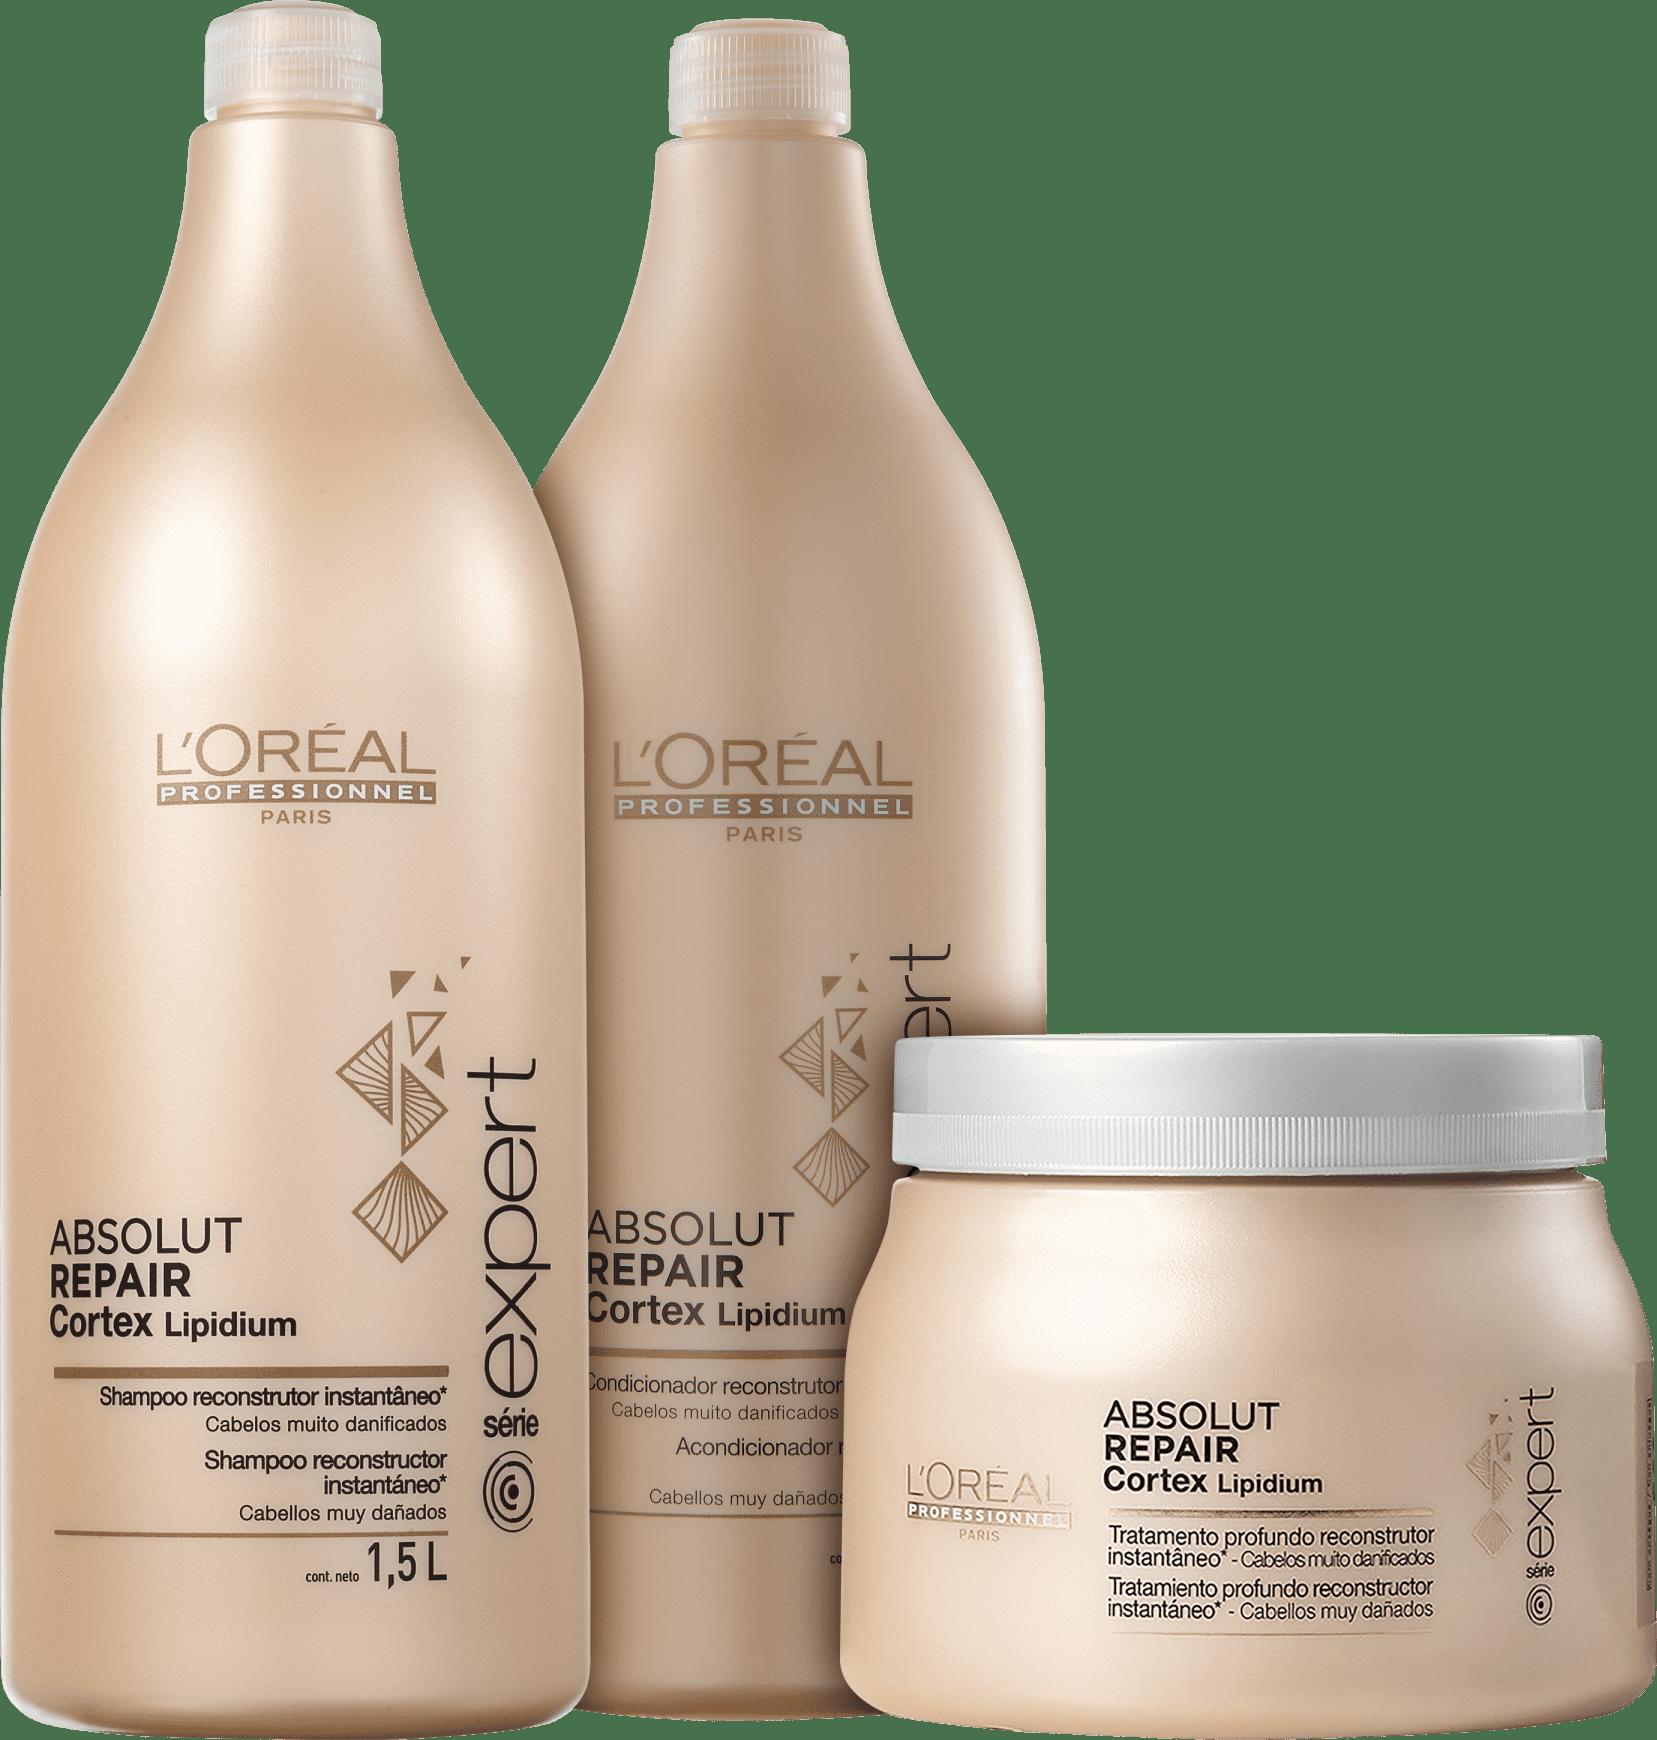 7688ad3f4 Kit L'Oréal Professionnel Expert Absolut Repair Cortex Lipidium Salão (3  Produtos)